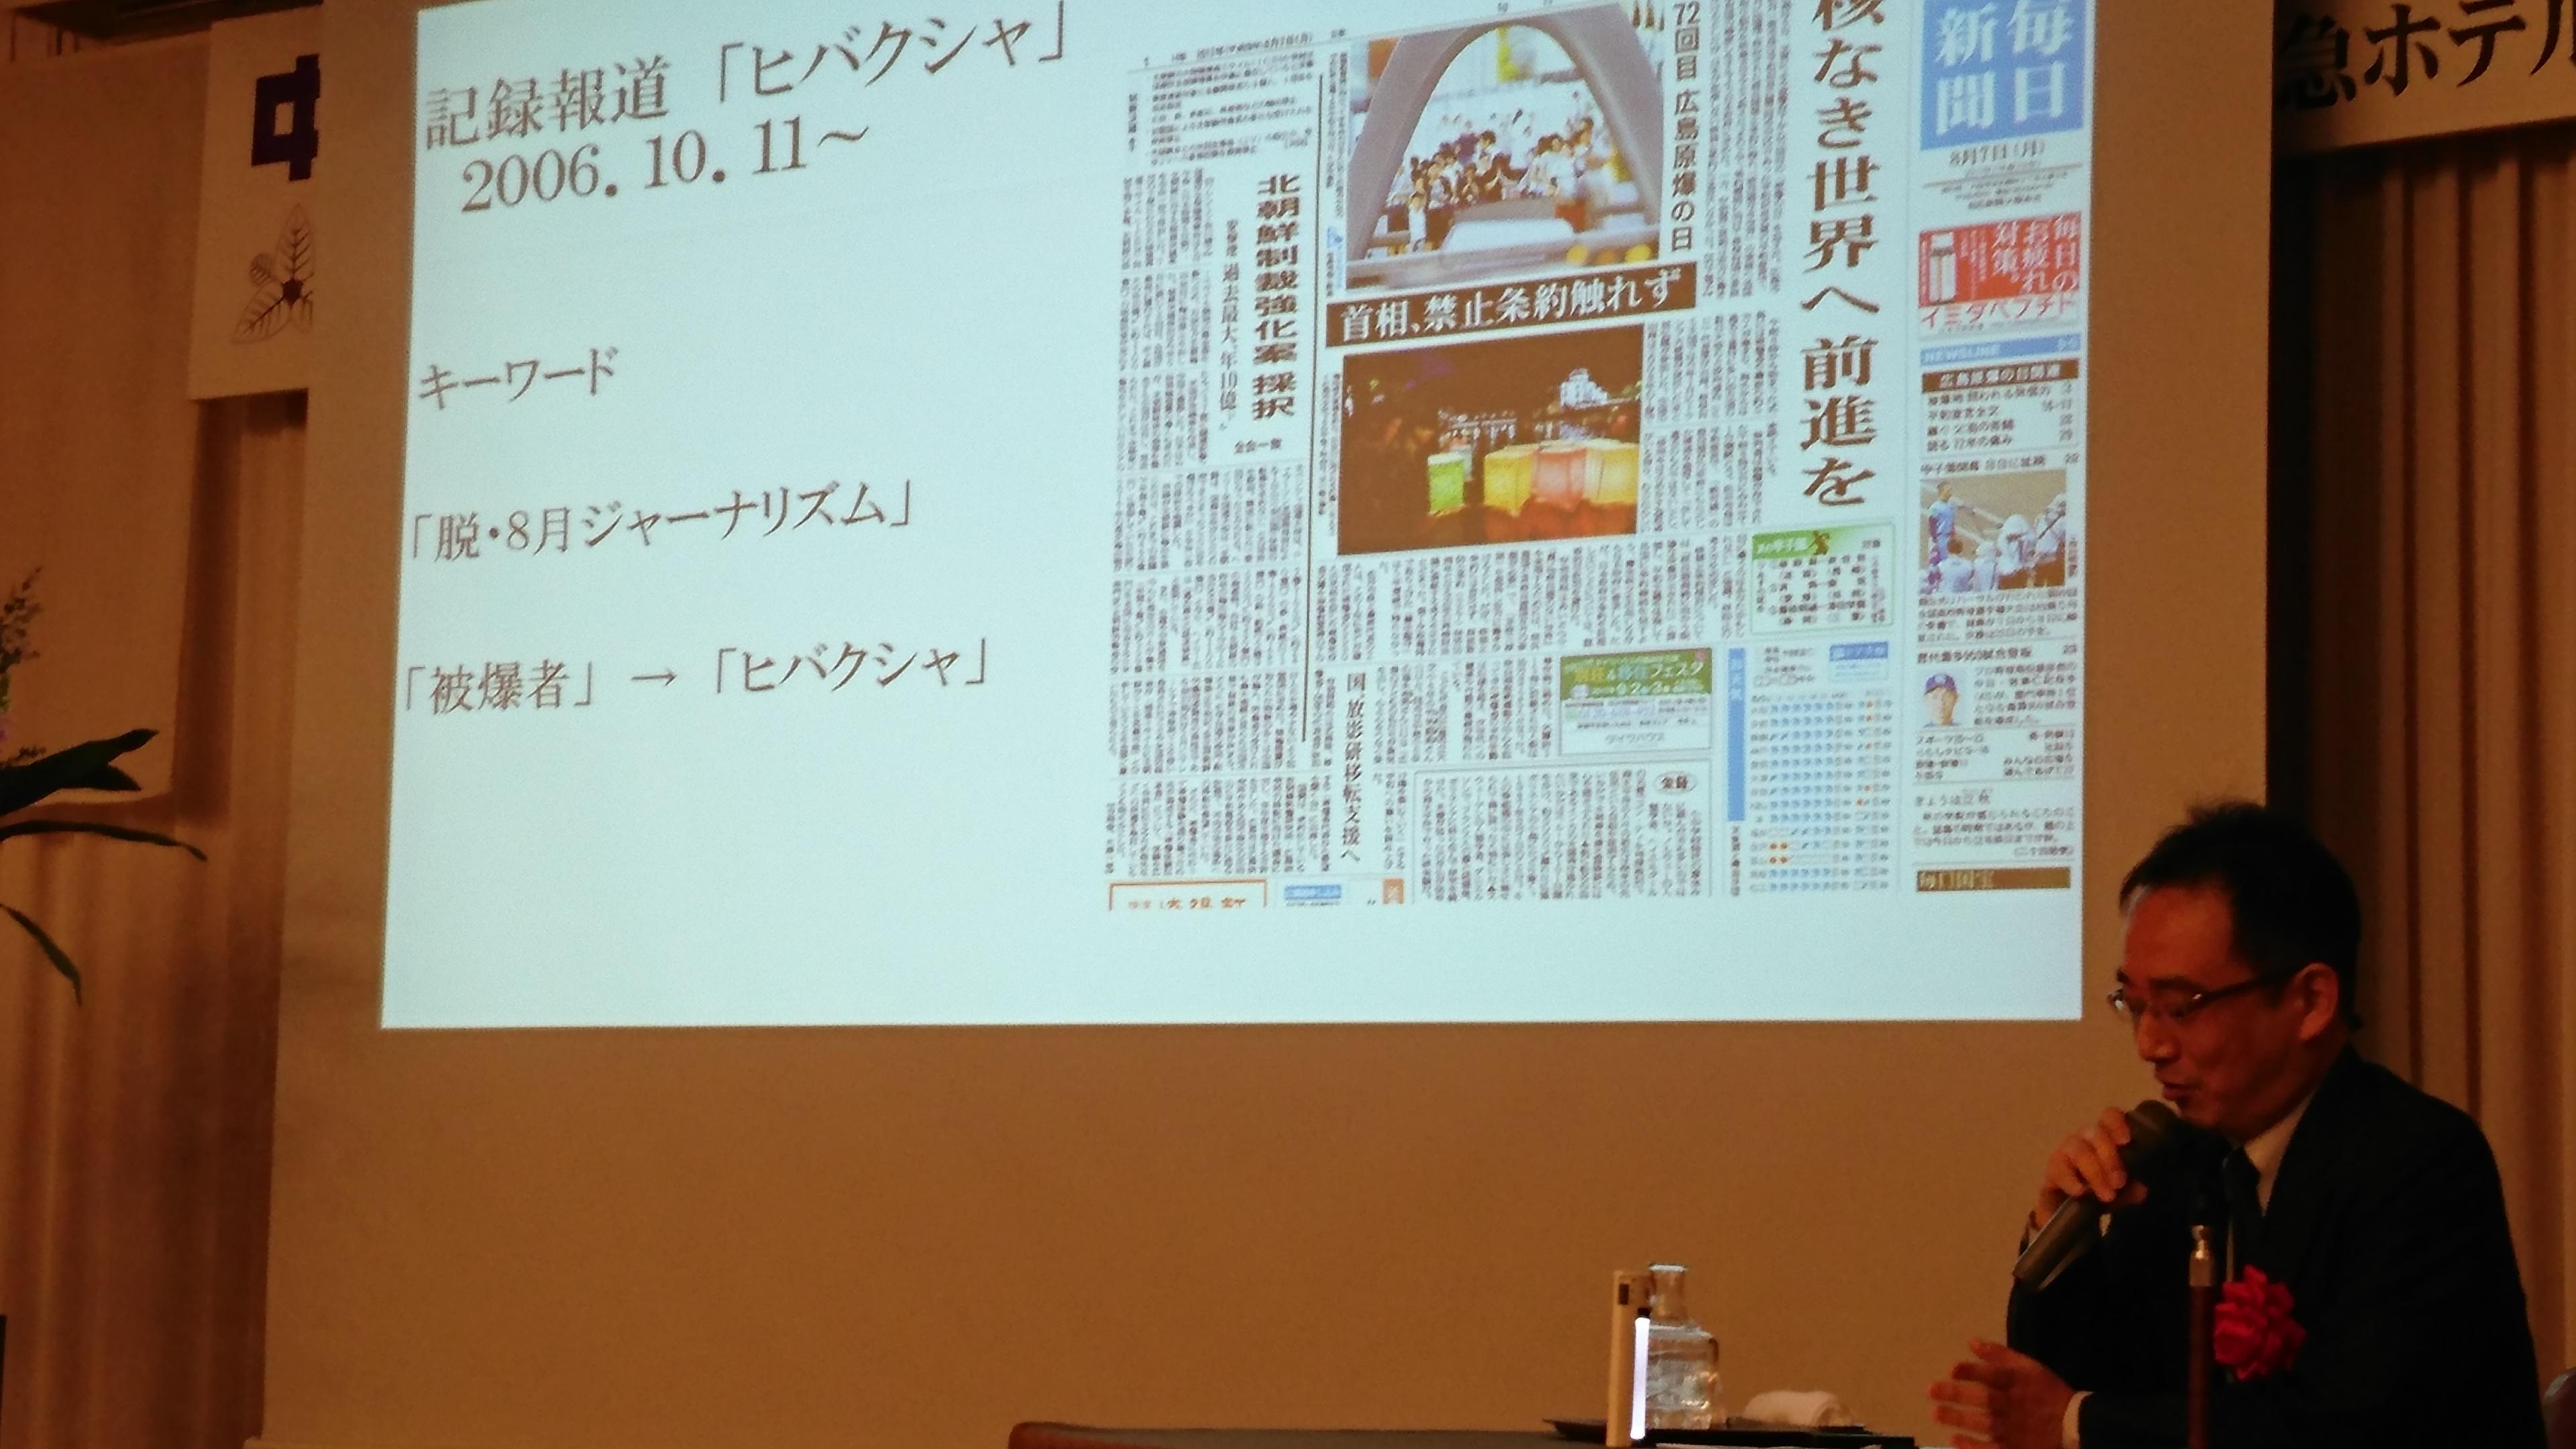 http://www.inoue-satoshi.com/diary/DSC_0721.JPG